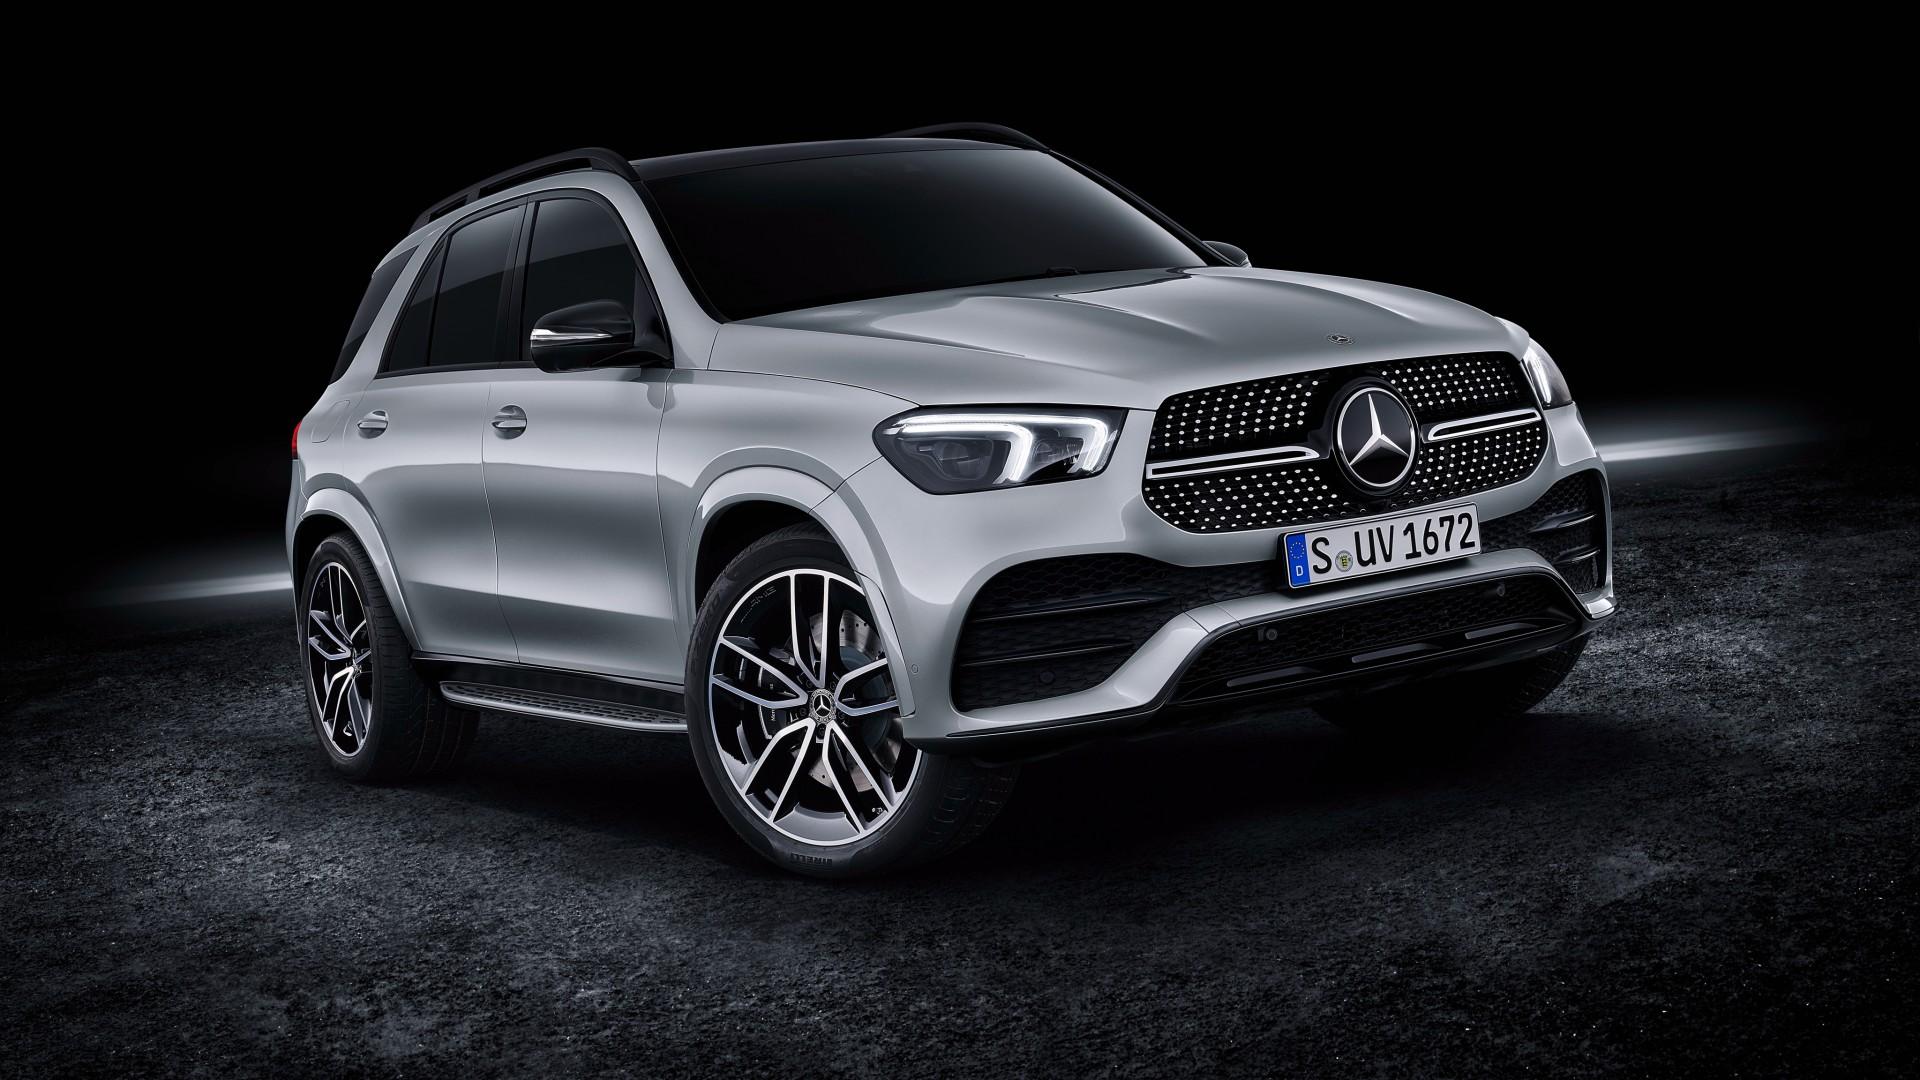 Mercedes Benz GLE 450 4MATIC AMG Line 2019 4K Wallpaper